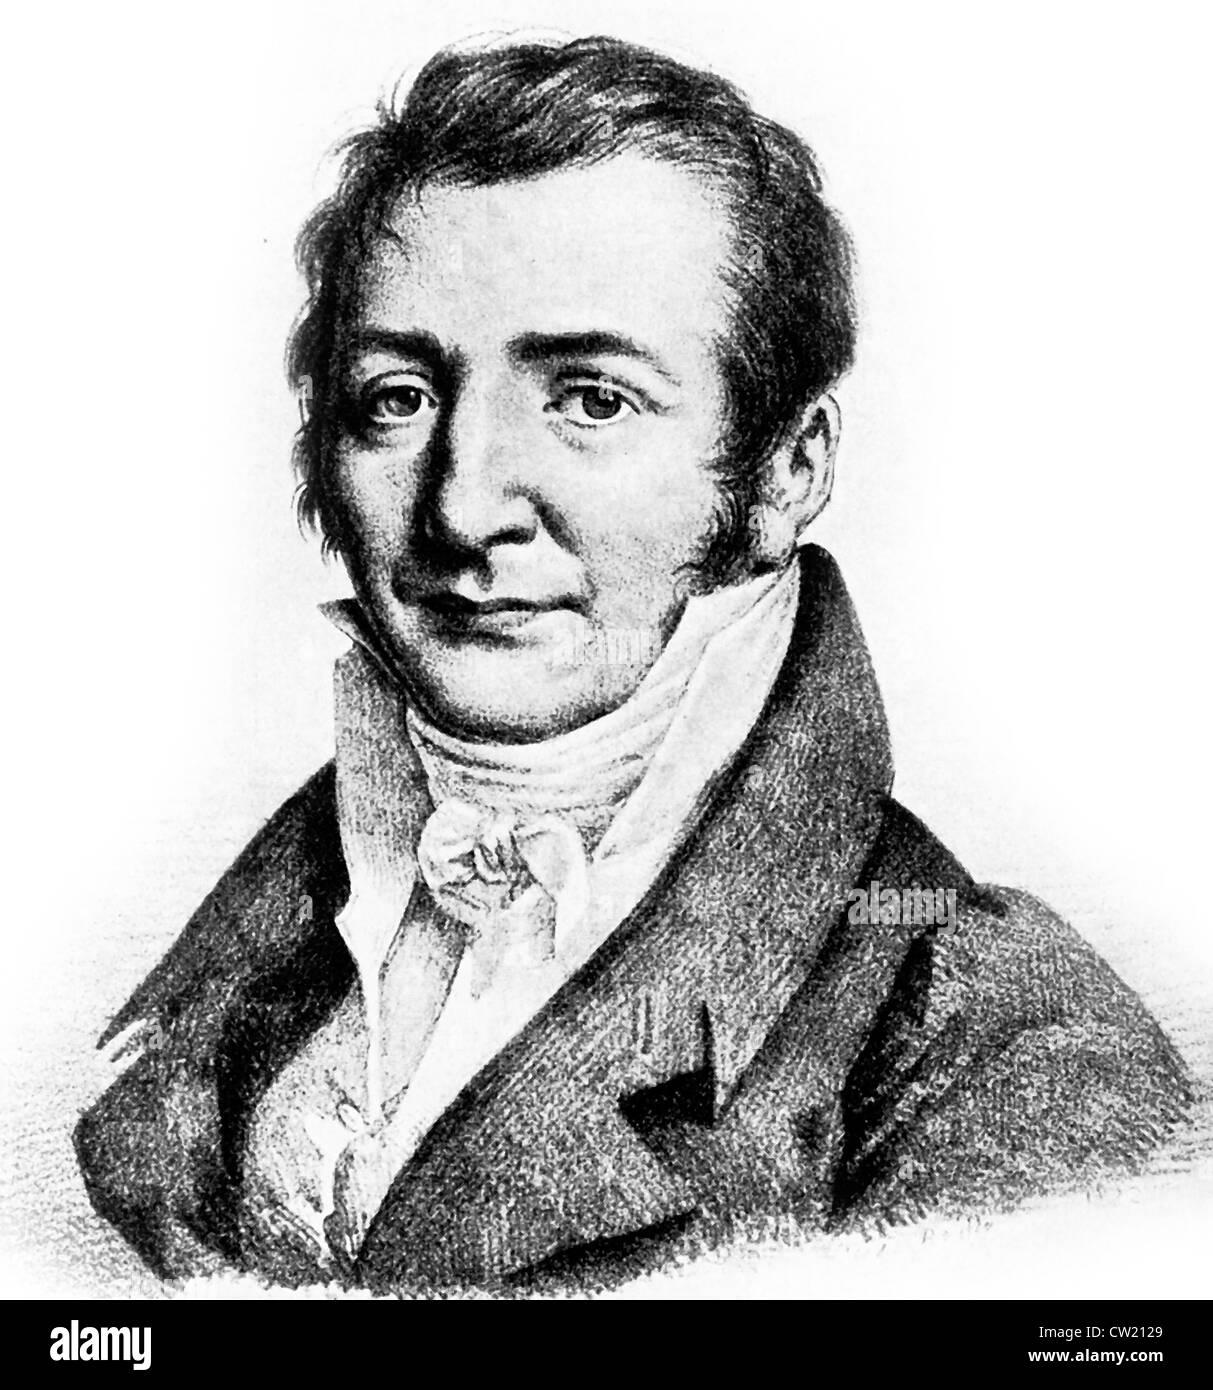 Joseph-Louis Gay-Lussac - NNDB